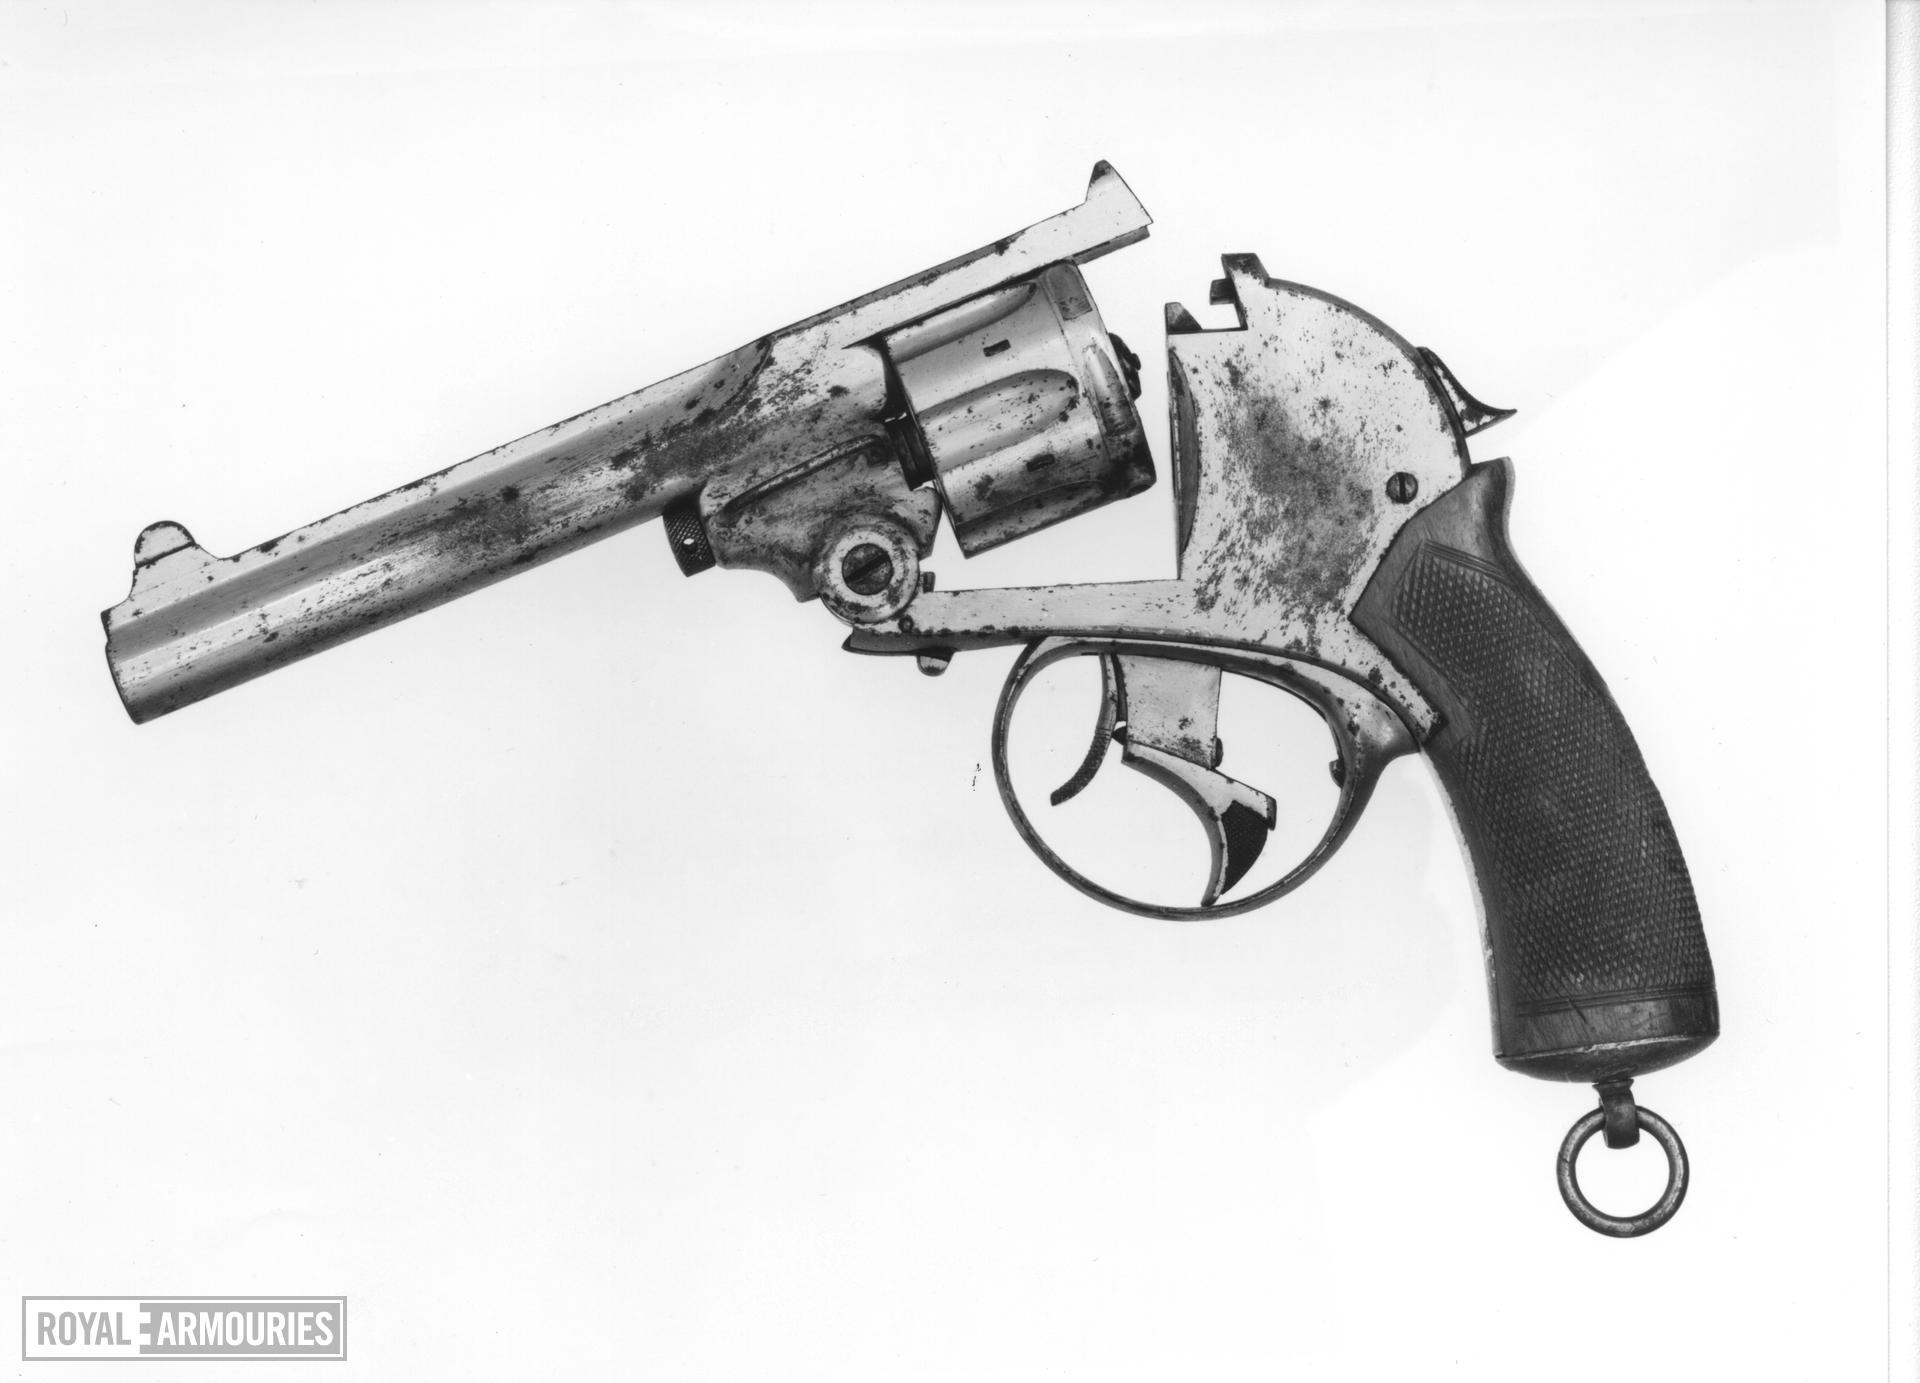 Centrefire six-shot revolver - Kynoch patent